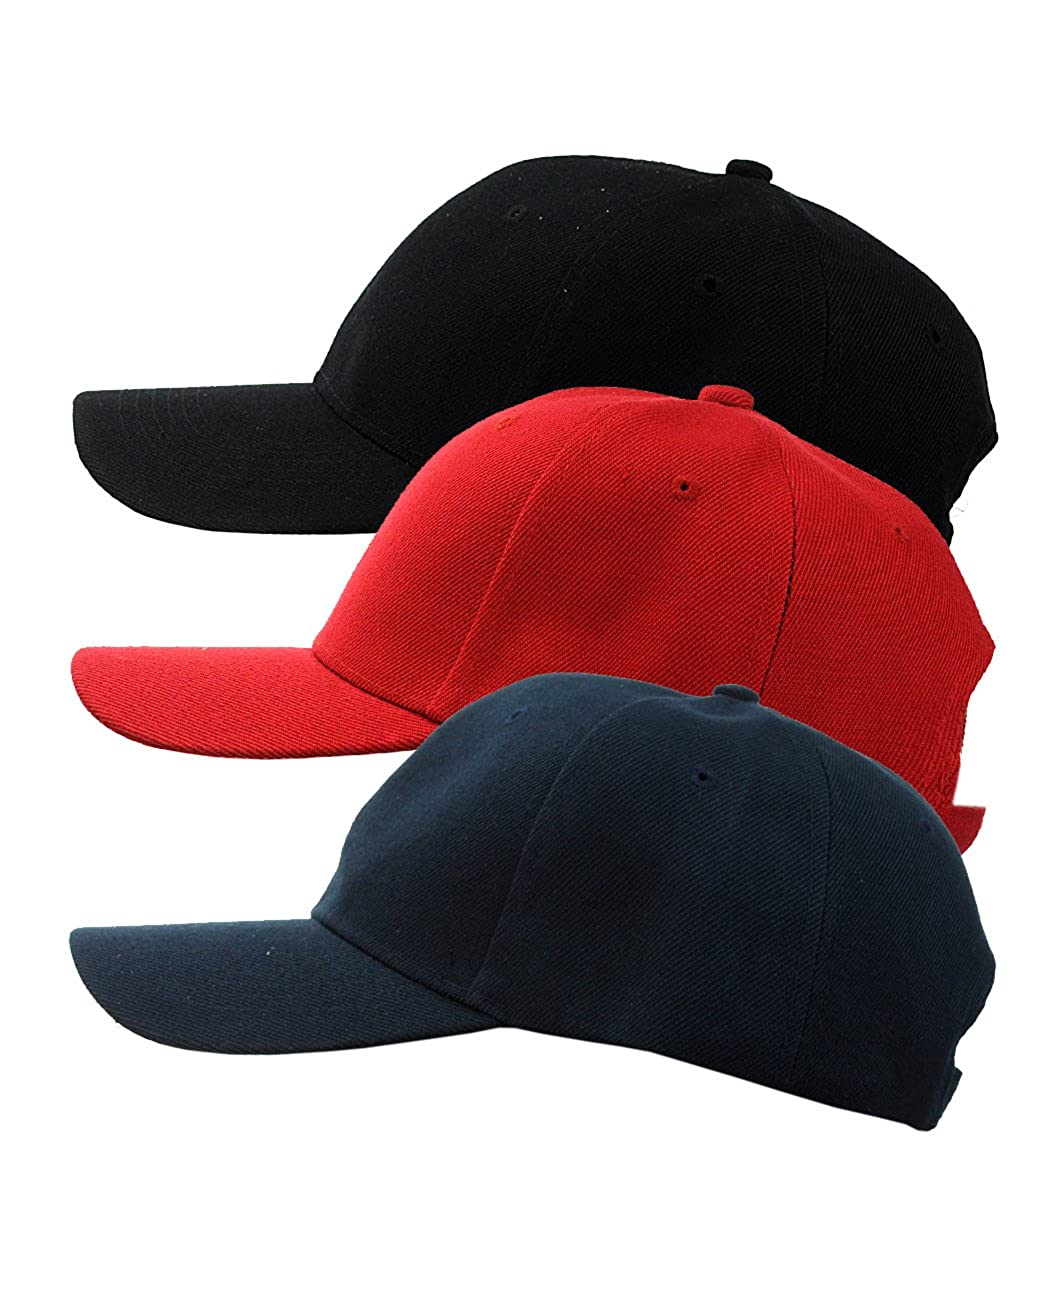 NYfashion101 Men s Adjustable Plain Velcro Baseball Cap Set of 3 ... 3dedf4706694